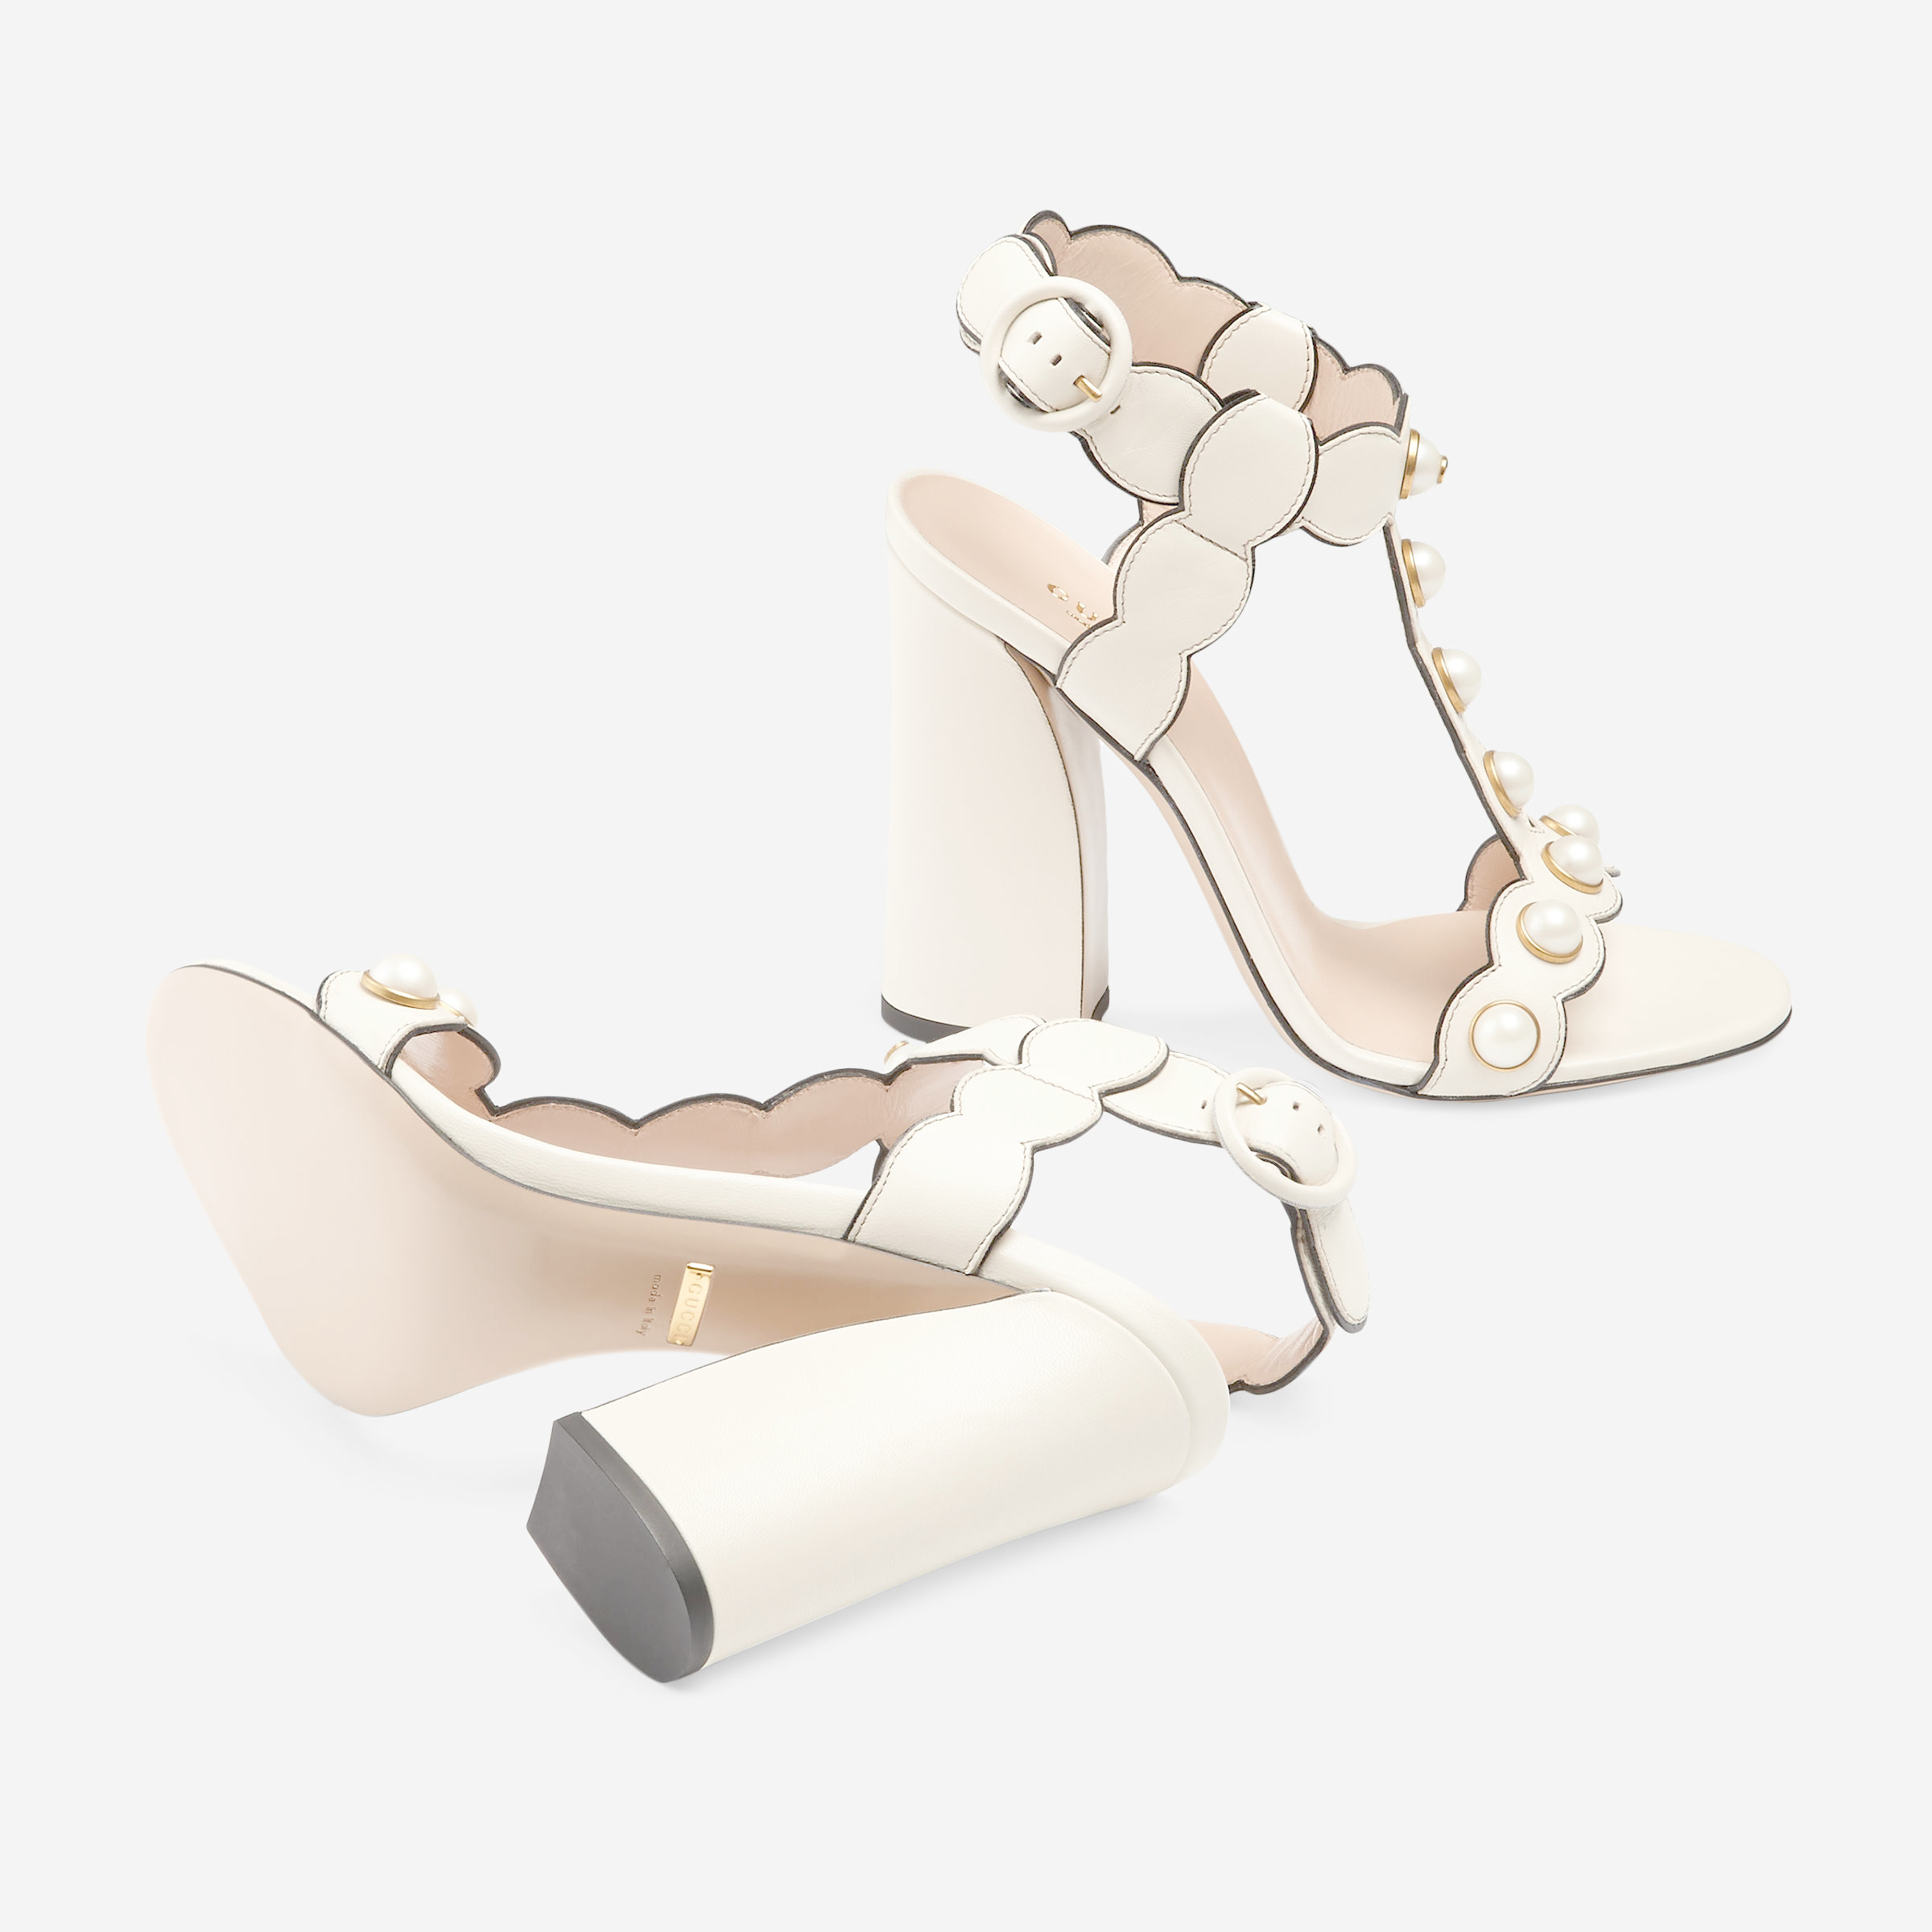 2fafc031bc3ecc Lyst - Gucci Leather T-strap Sandal in Natural